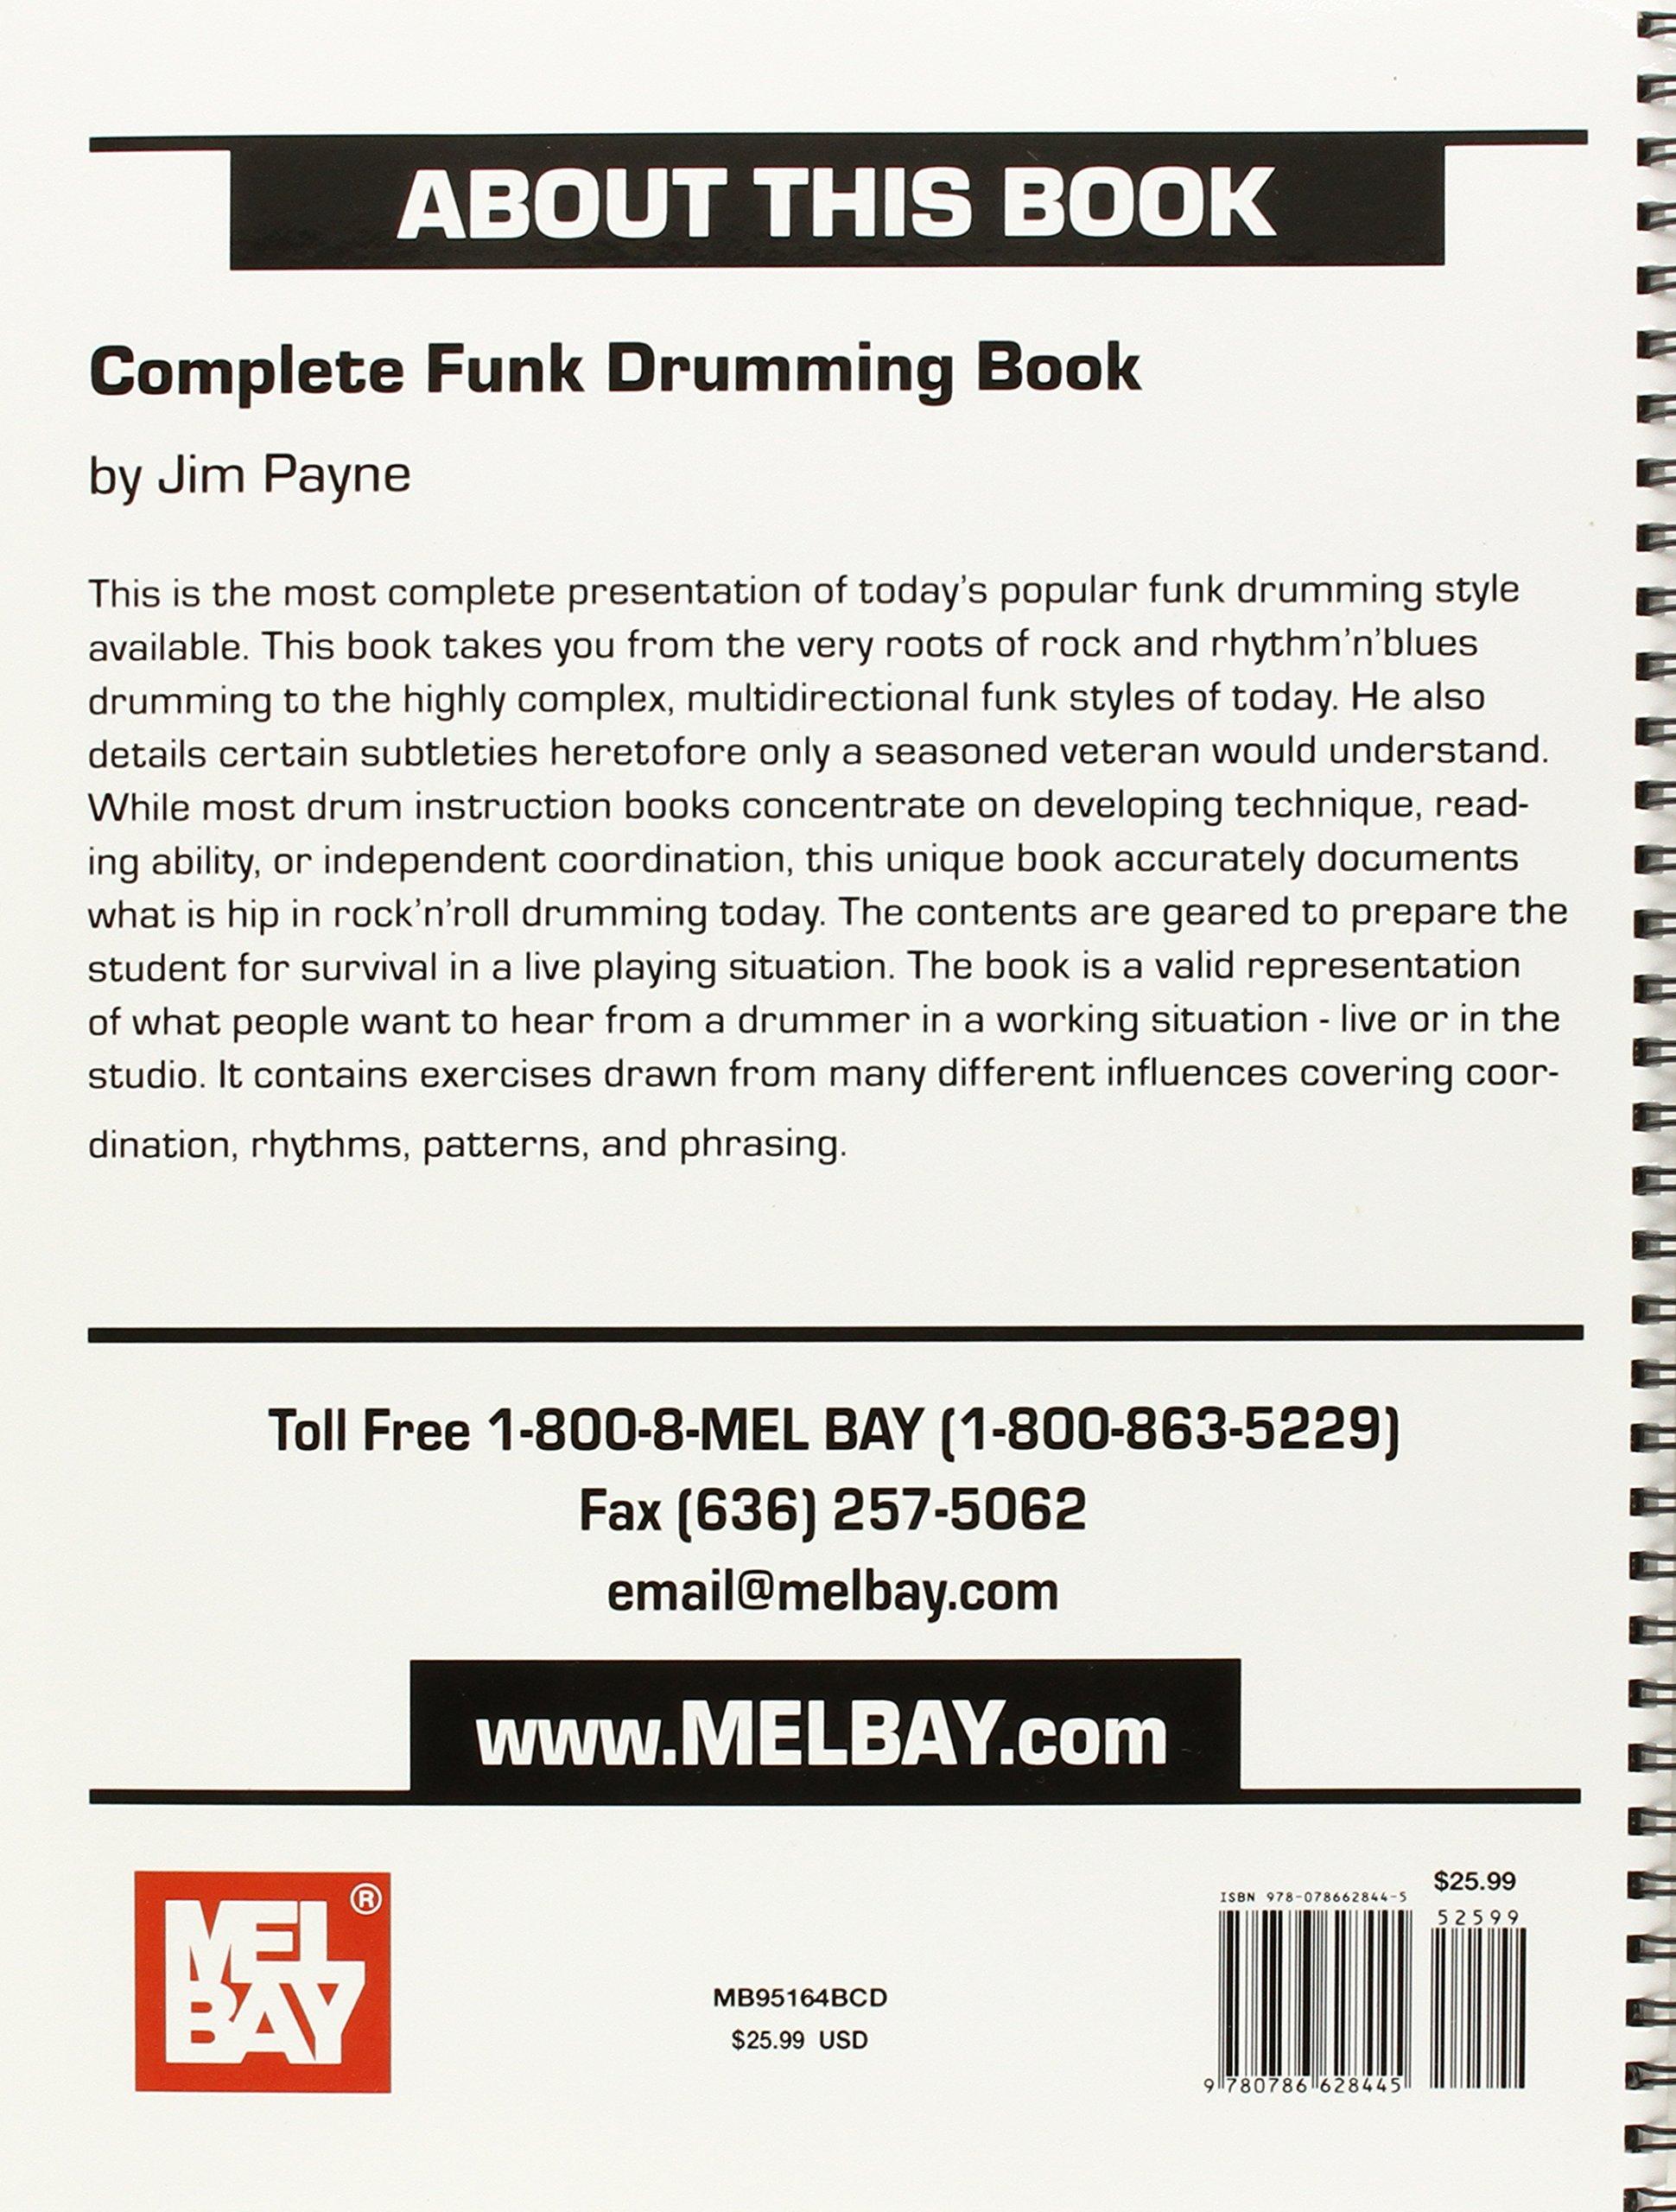 Mel bay complete funk drumming book jim payne 9780786628445 mel bay complete funk drumming book jim payne 9780786628445 amazon books hexwebz Gallery